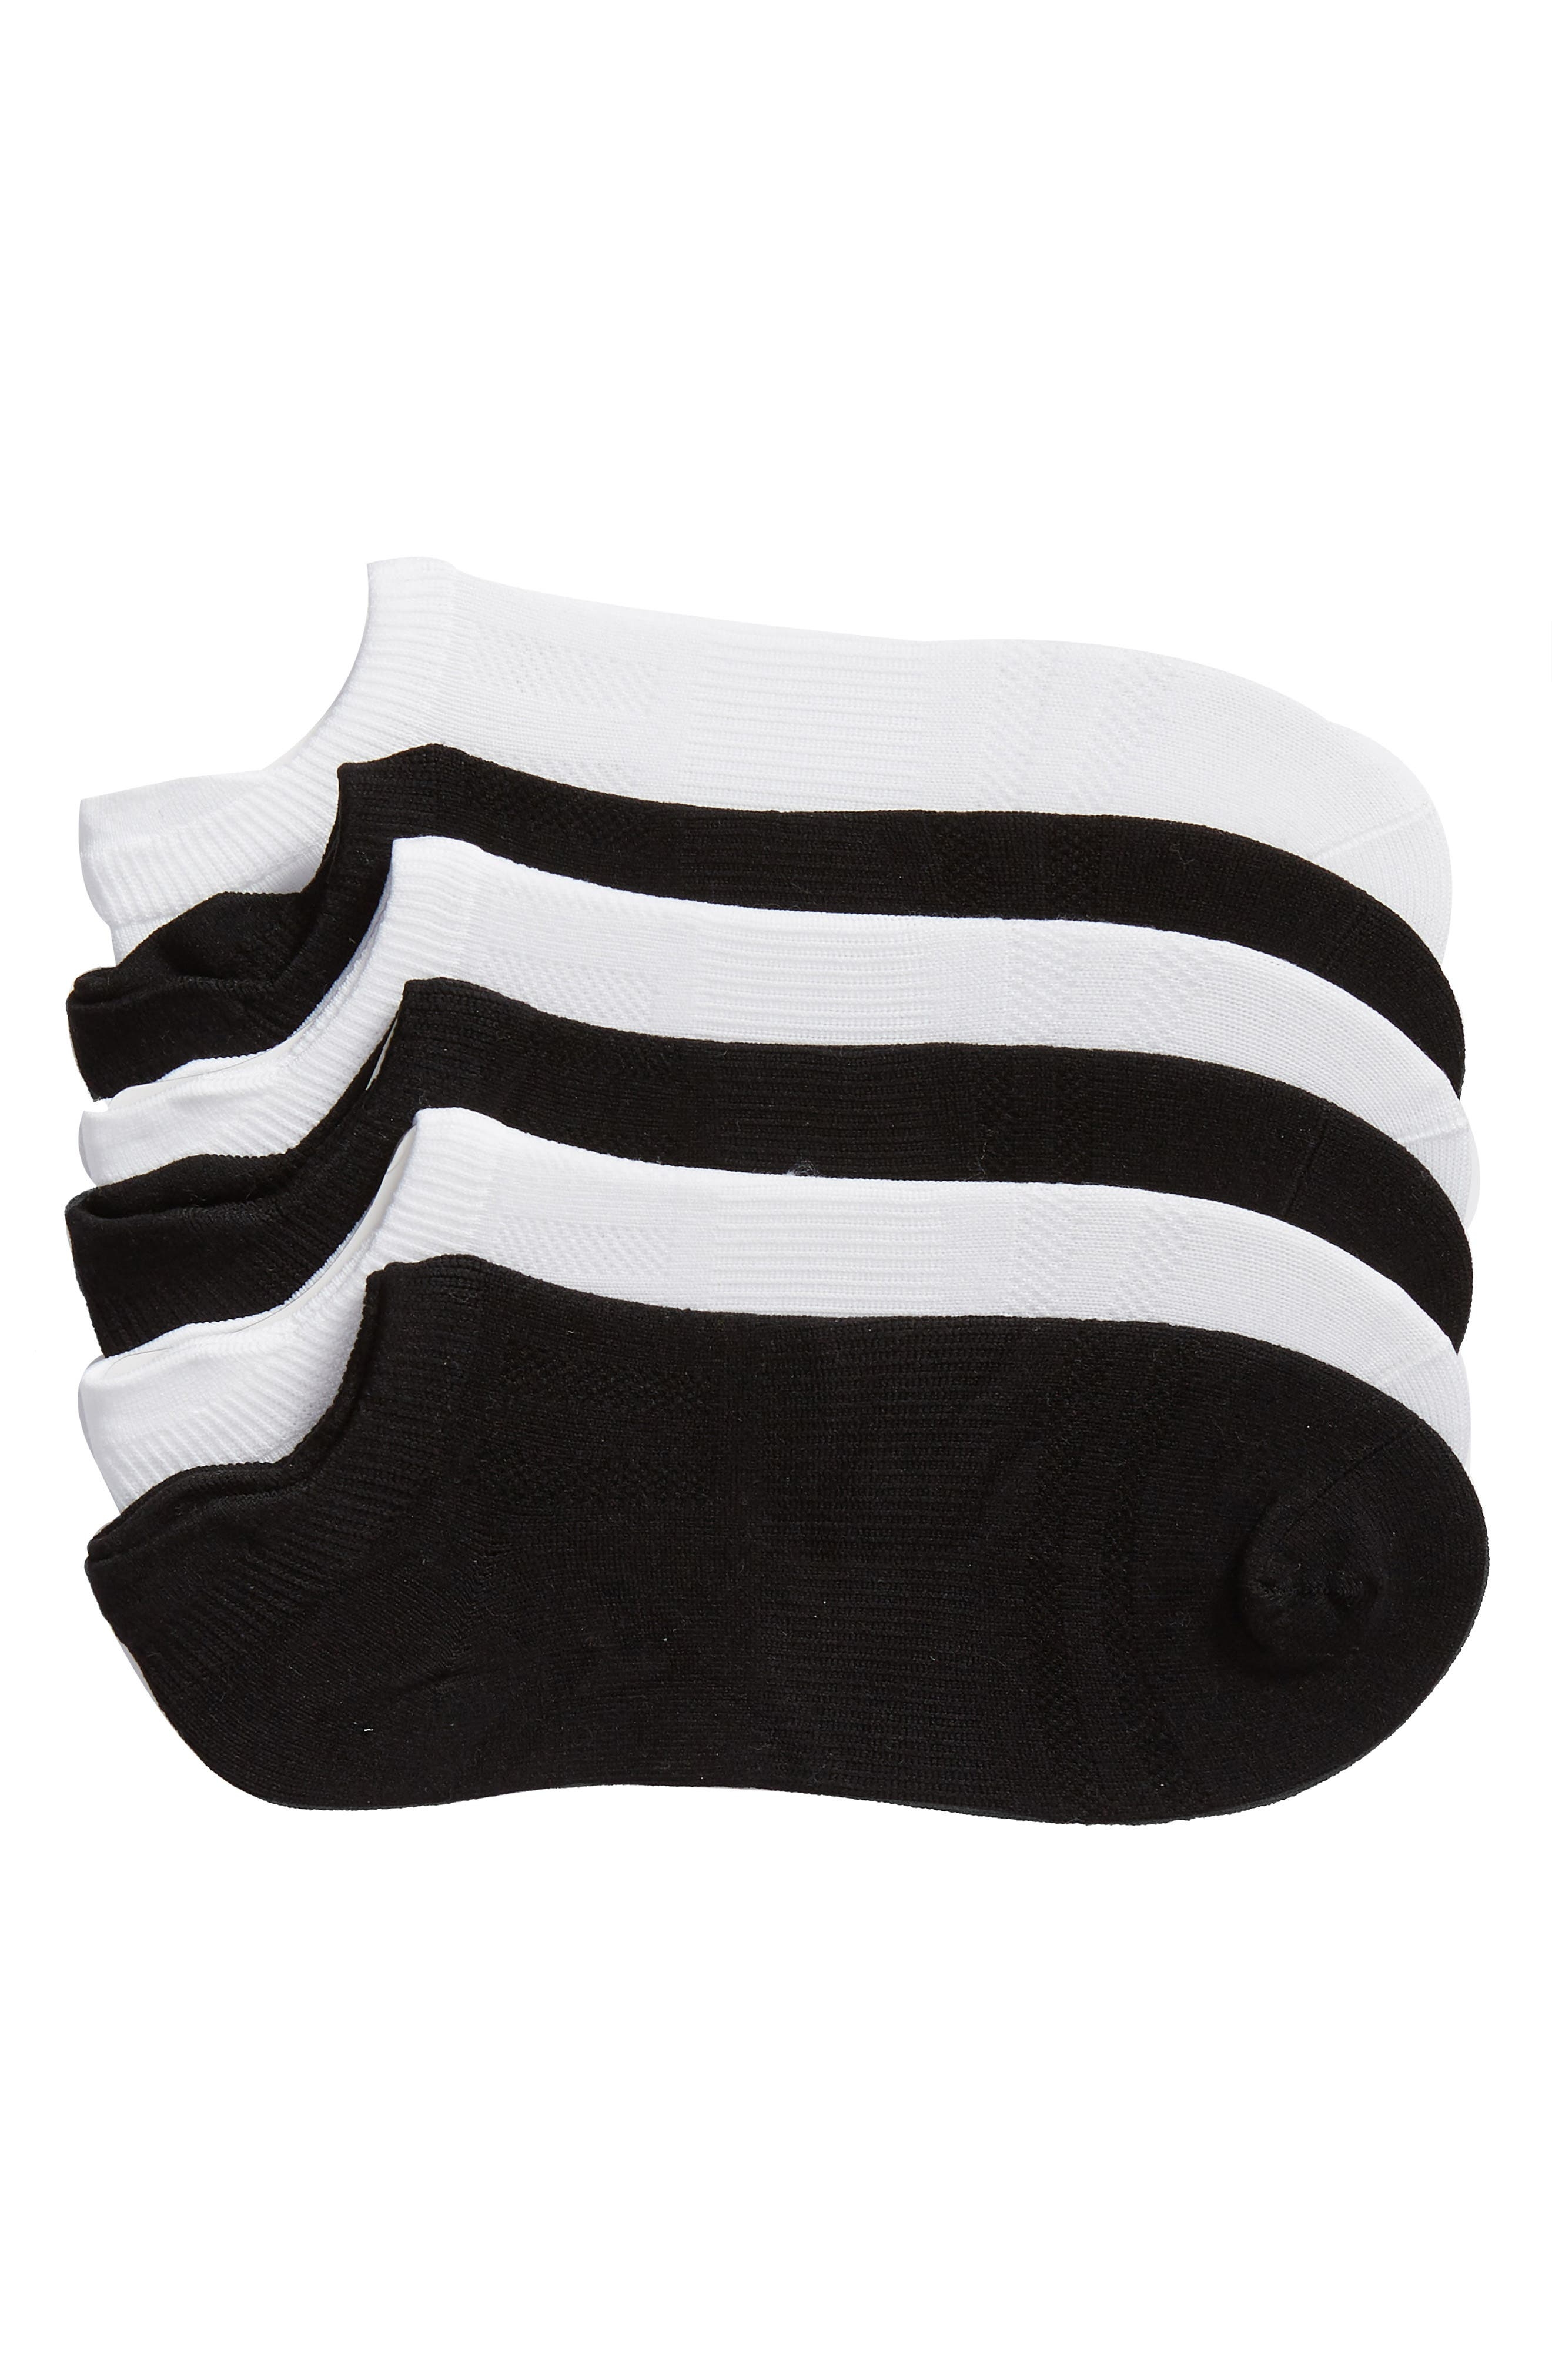 SOF SOLE 6-Pack Low Cut Socks, Main, color, WHITE/ BLACK